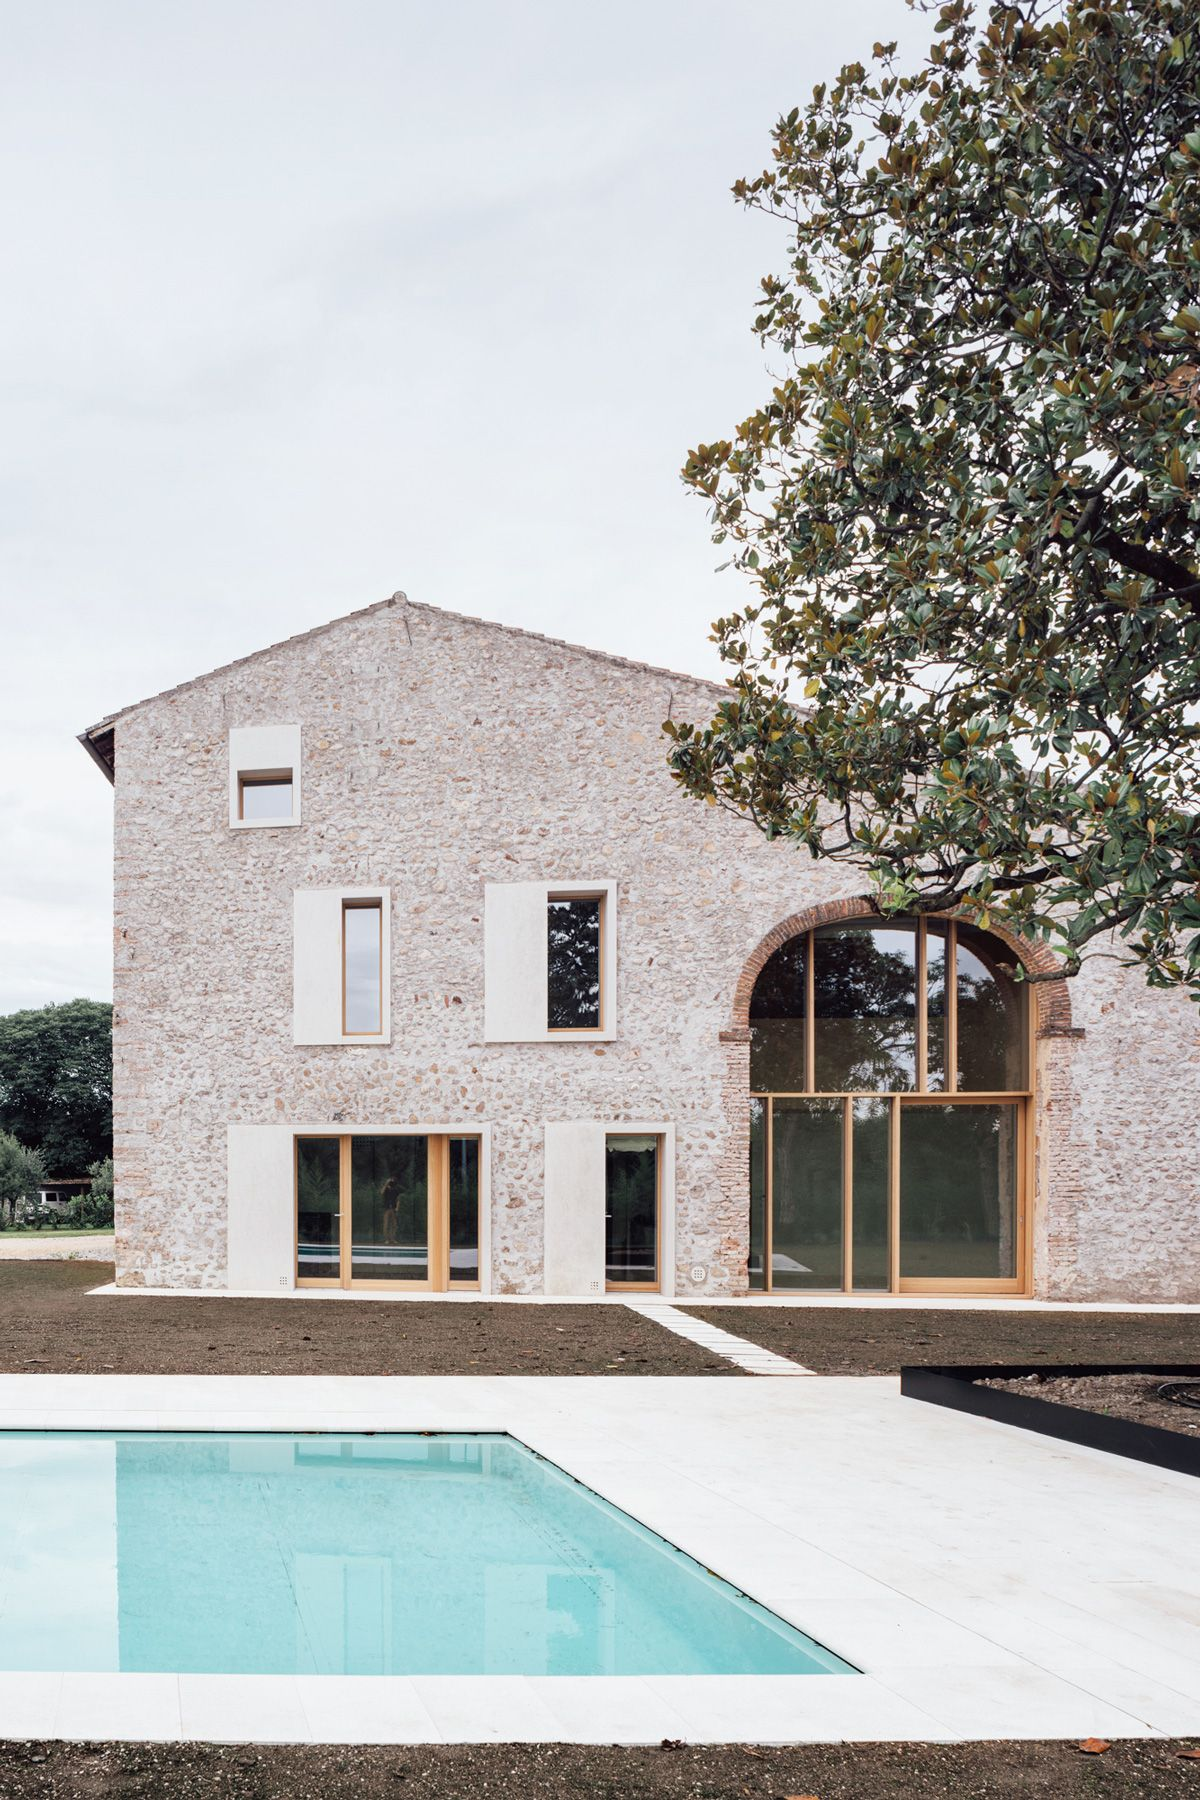 Facciata Casa Di Campagna casa di campagna al chievo - studio wok | architettura